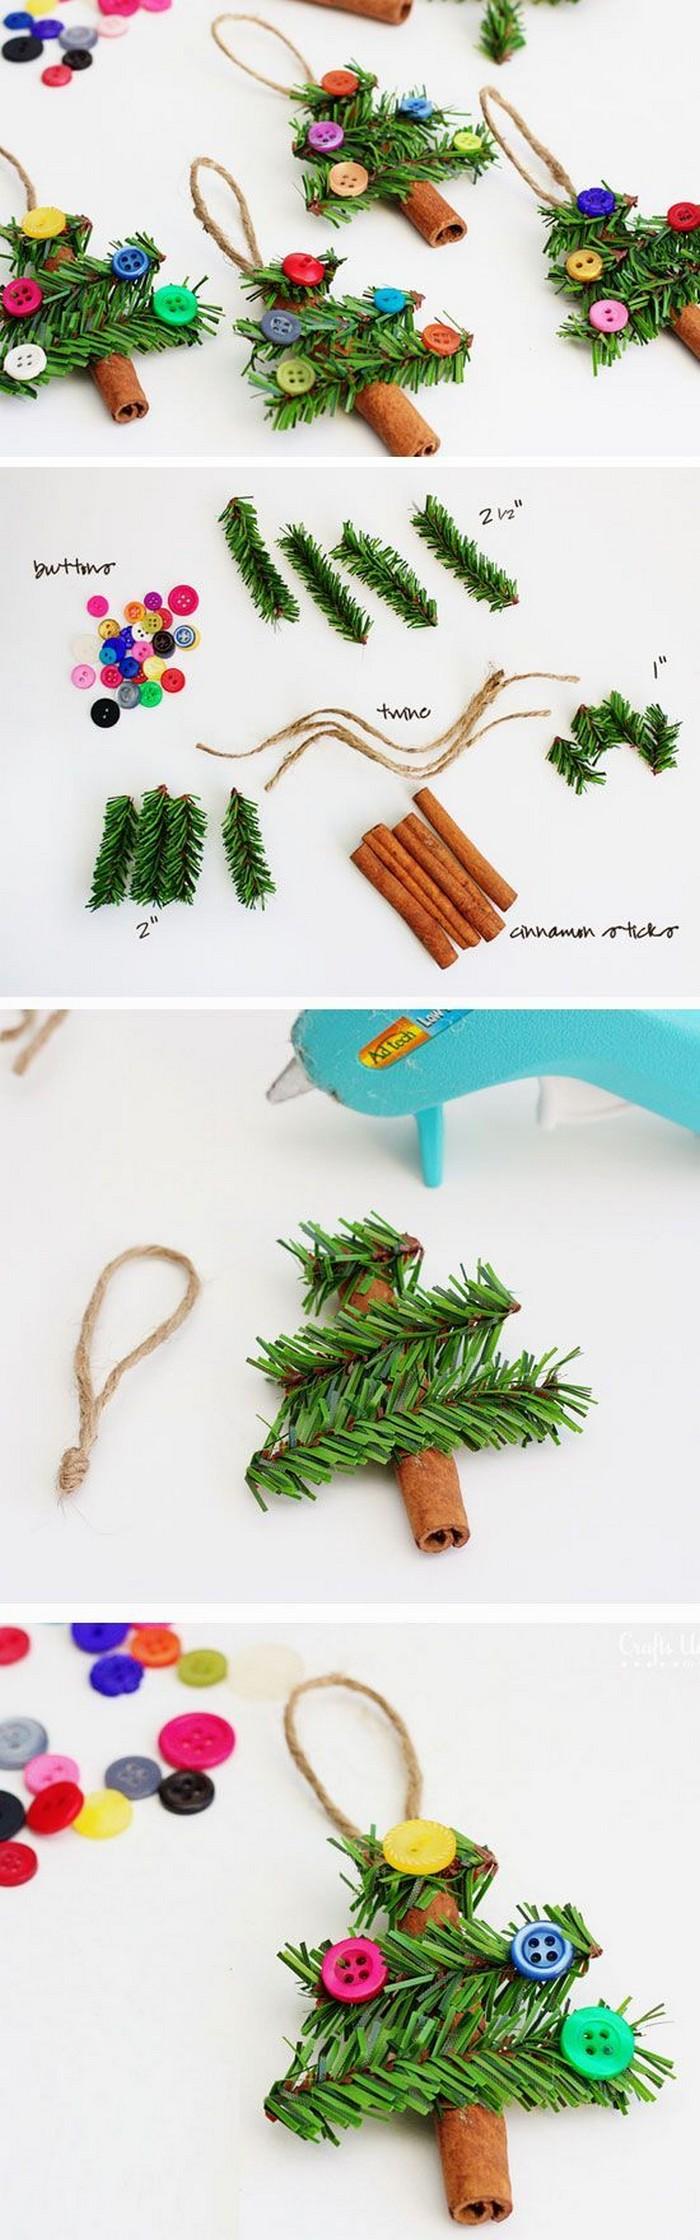 Cinnamon Stick Tree Ornaments 25 Interesting Ideas to Make Easy Christmas Crafts